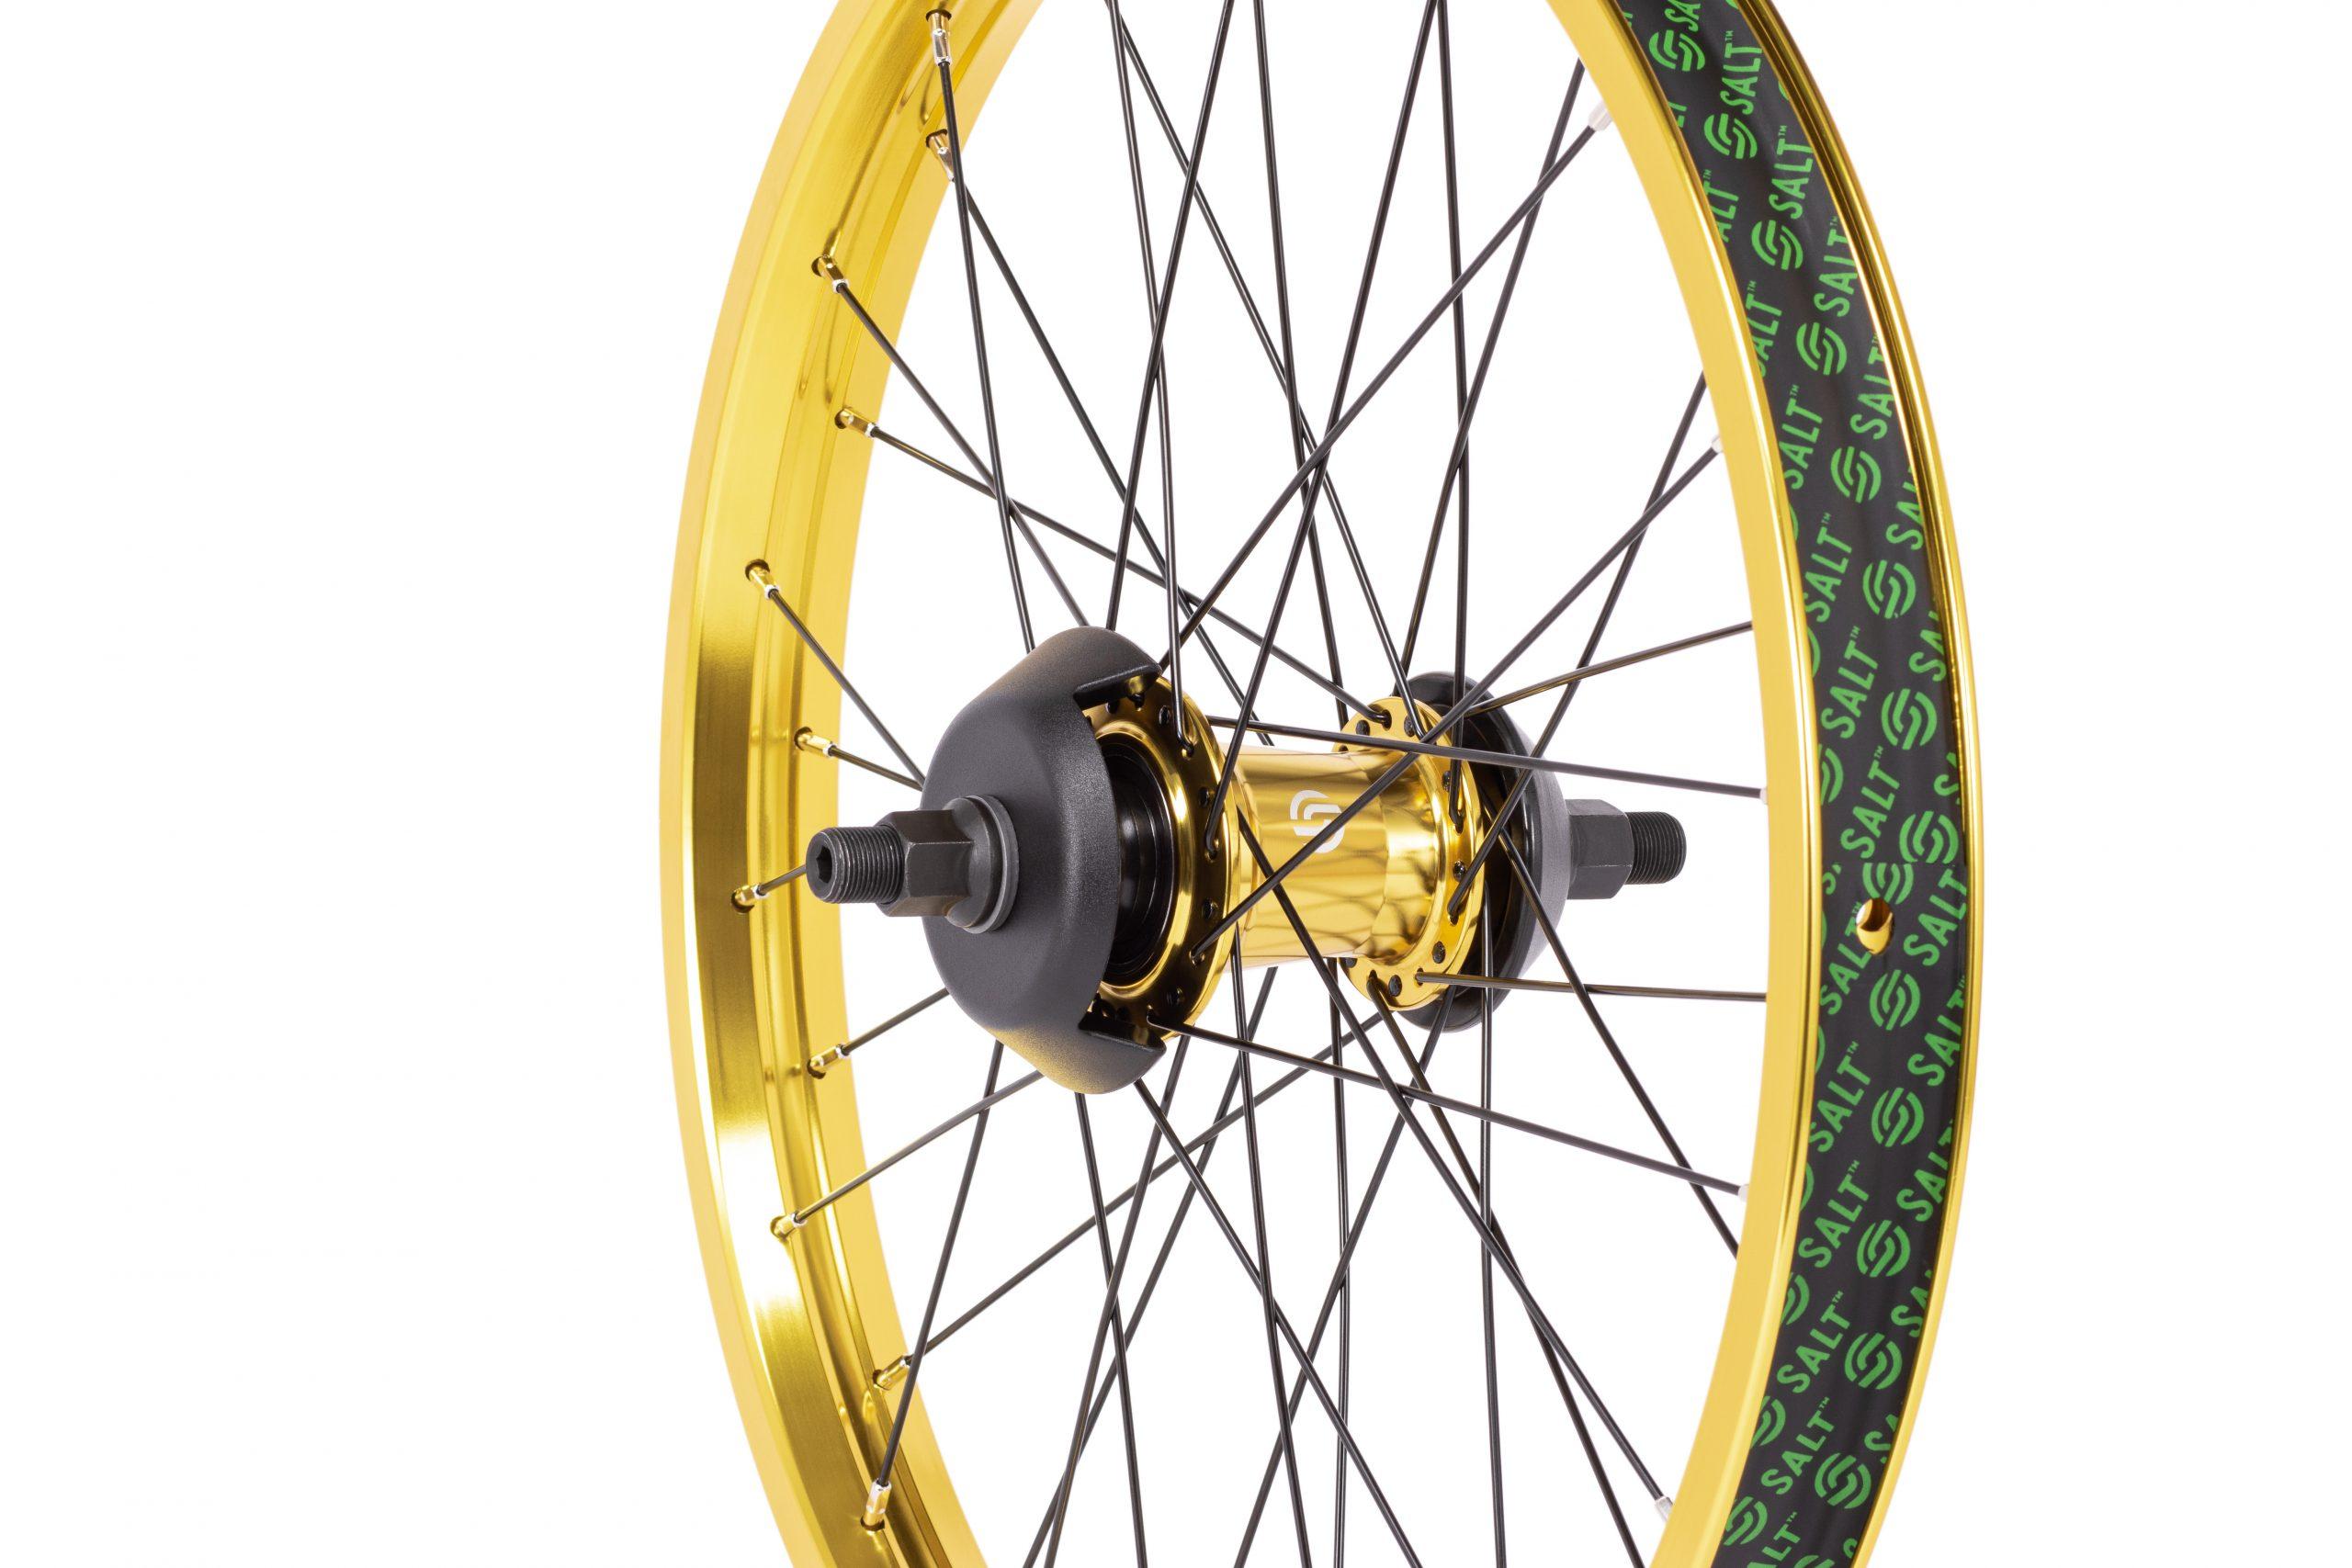 Salt_Everest_FC_rear_wheel_gold-03